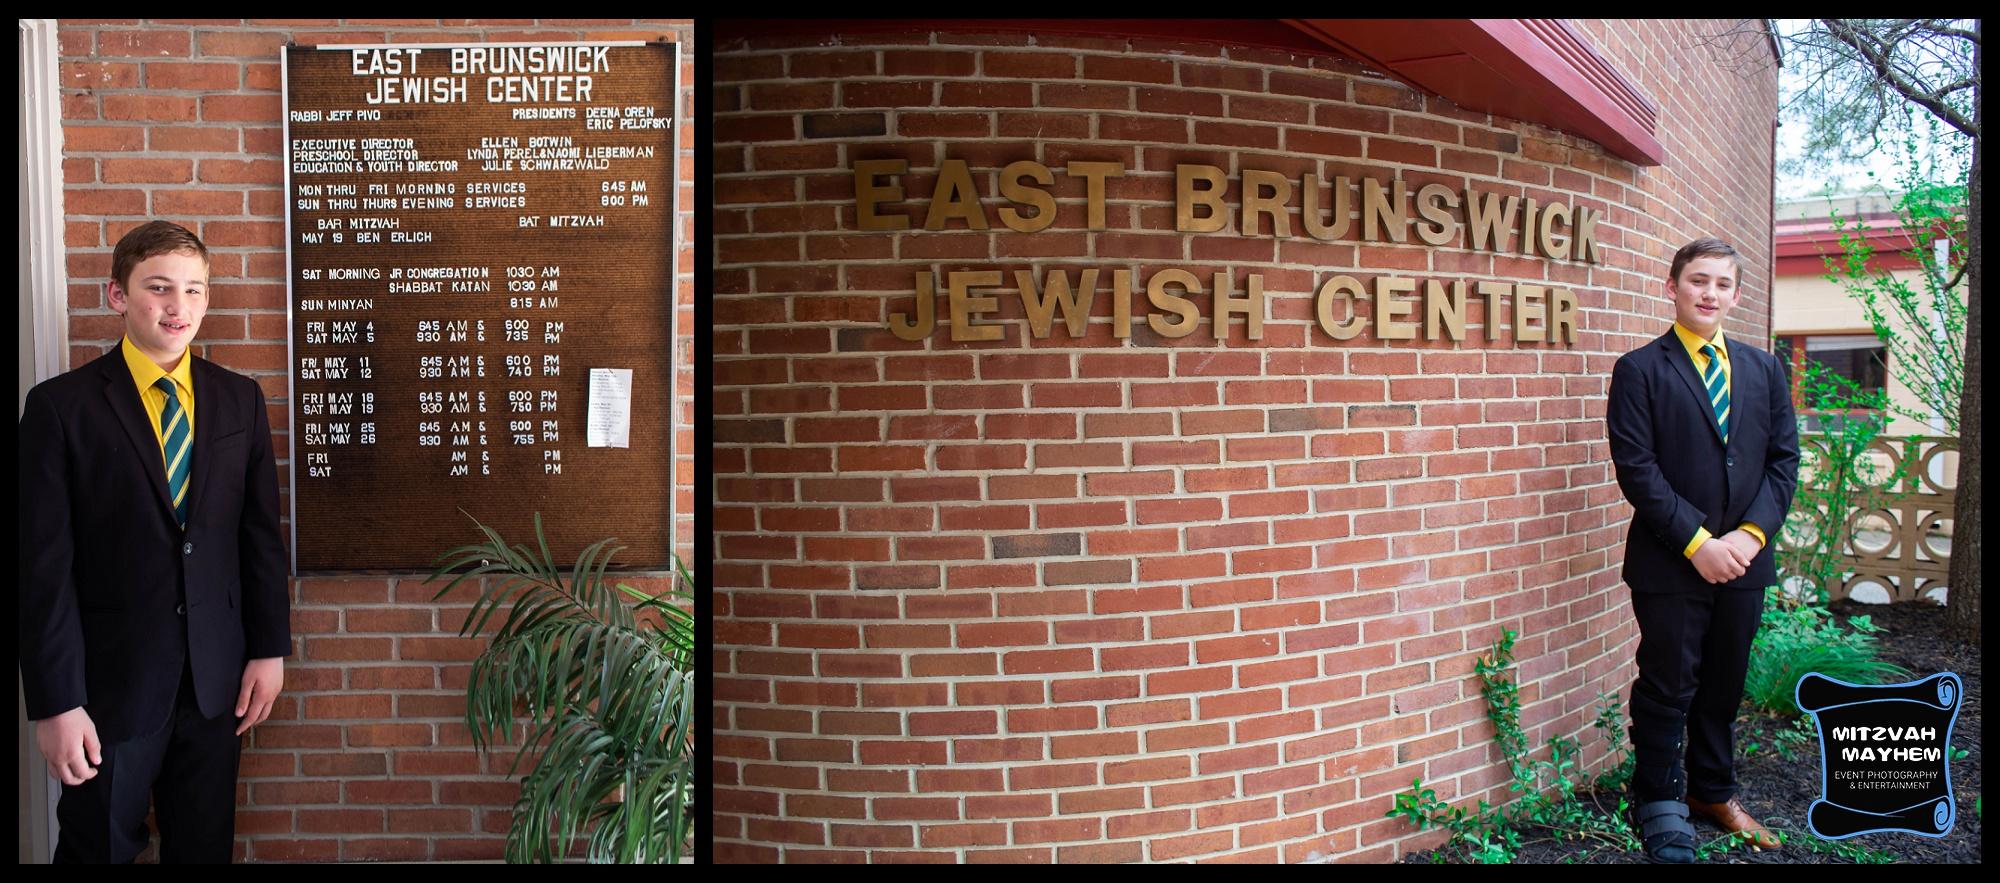 Ben-East-Brunswick-Jewish-Center-6.JPG